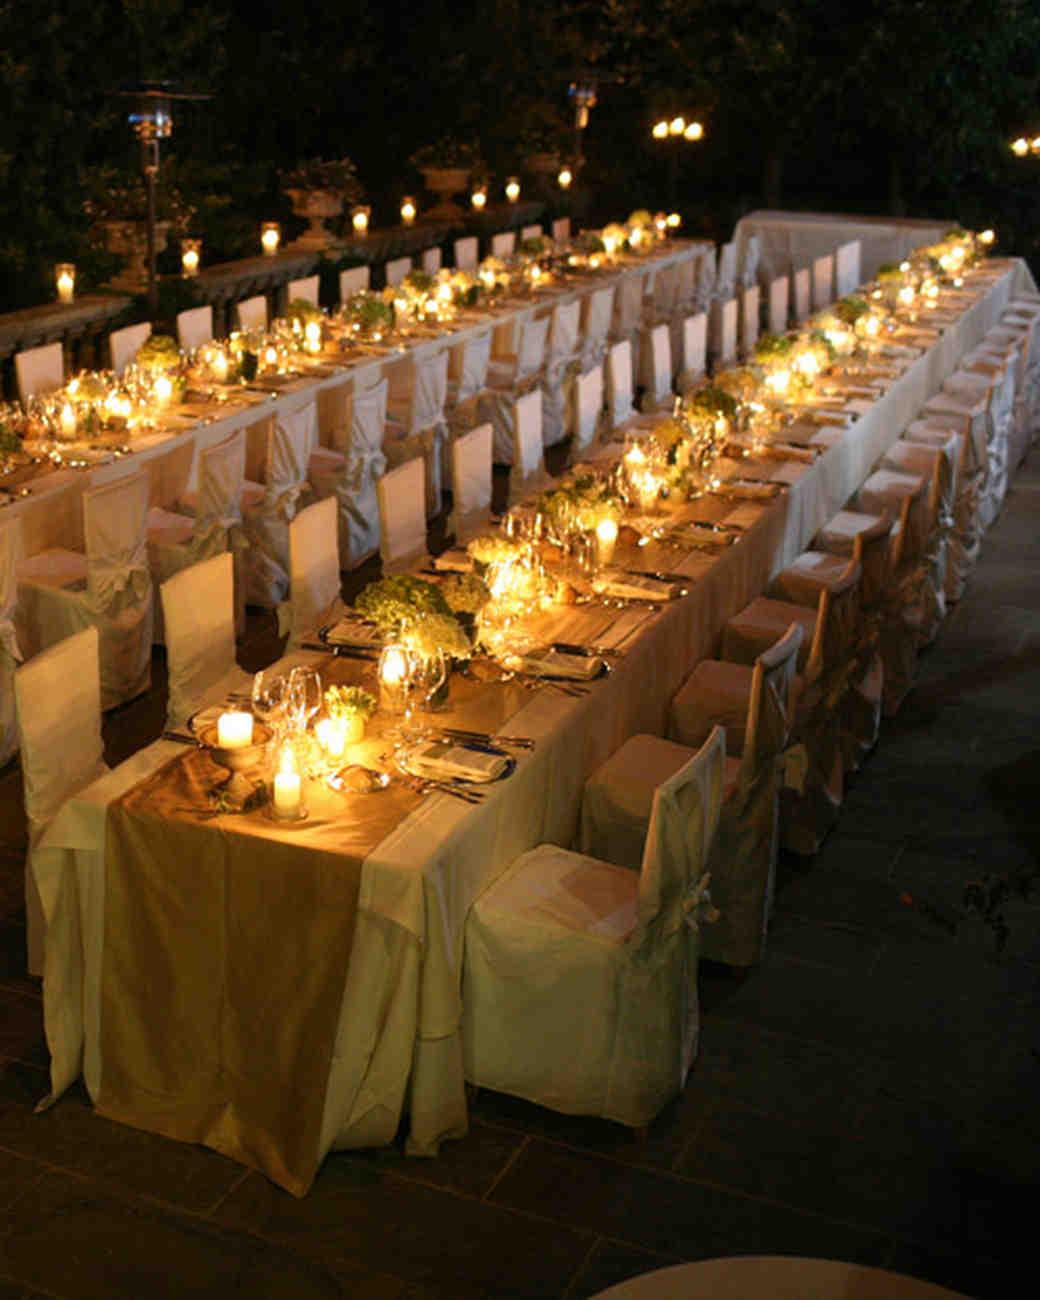 A Formal Outdoor Destination Wedding in Tuscany Italy | Martha Stewart Weddings & A Formal Outdoor Destination Wedding in Tuscany Italy | Martha ... azcodes.com